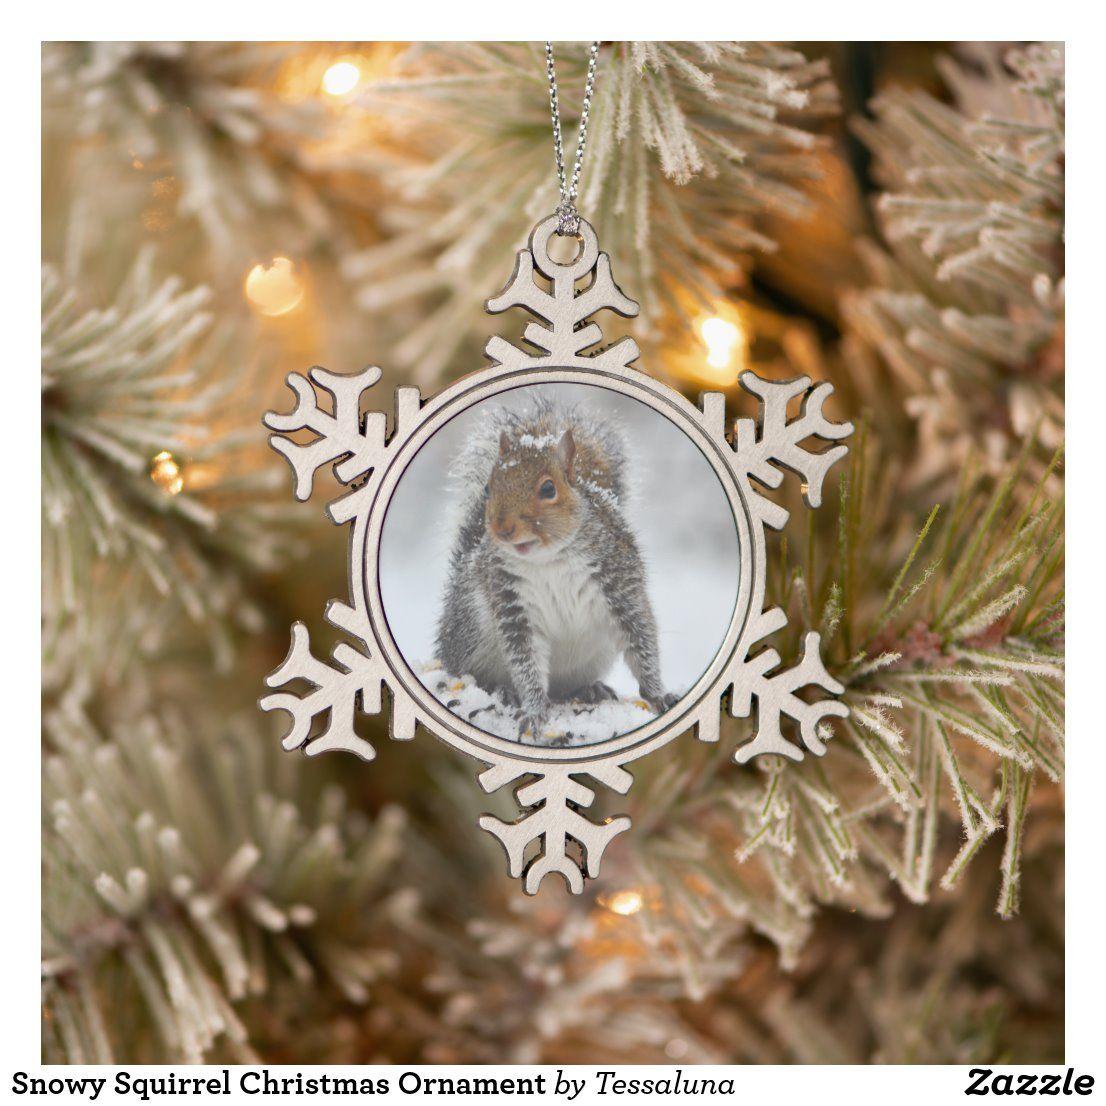 Snowy Squirrel Christmas Ornament Zazzle Com Christmas Ornaments Canada Christmas Personalized Christmas Ornaments